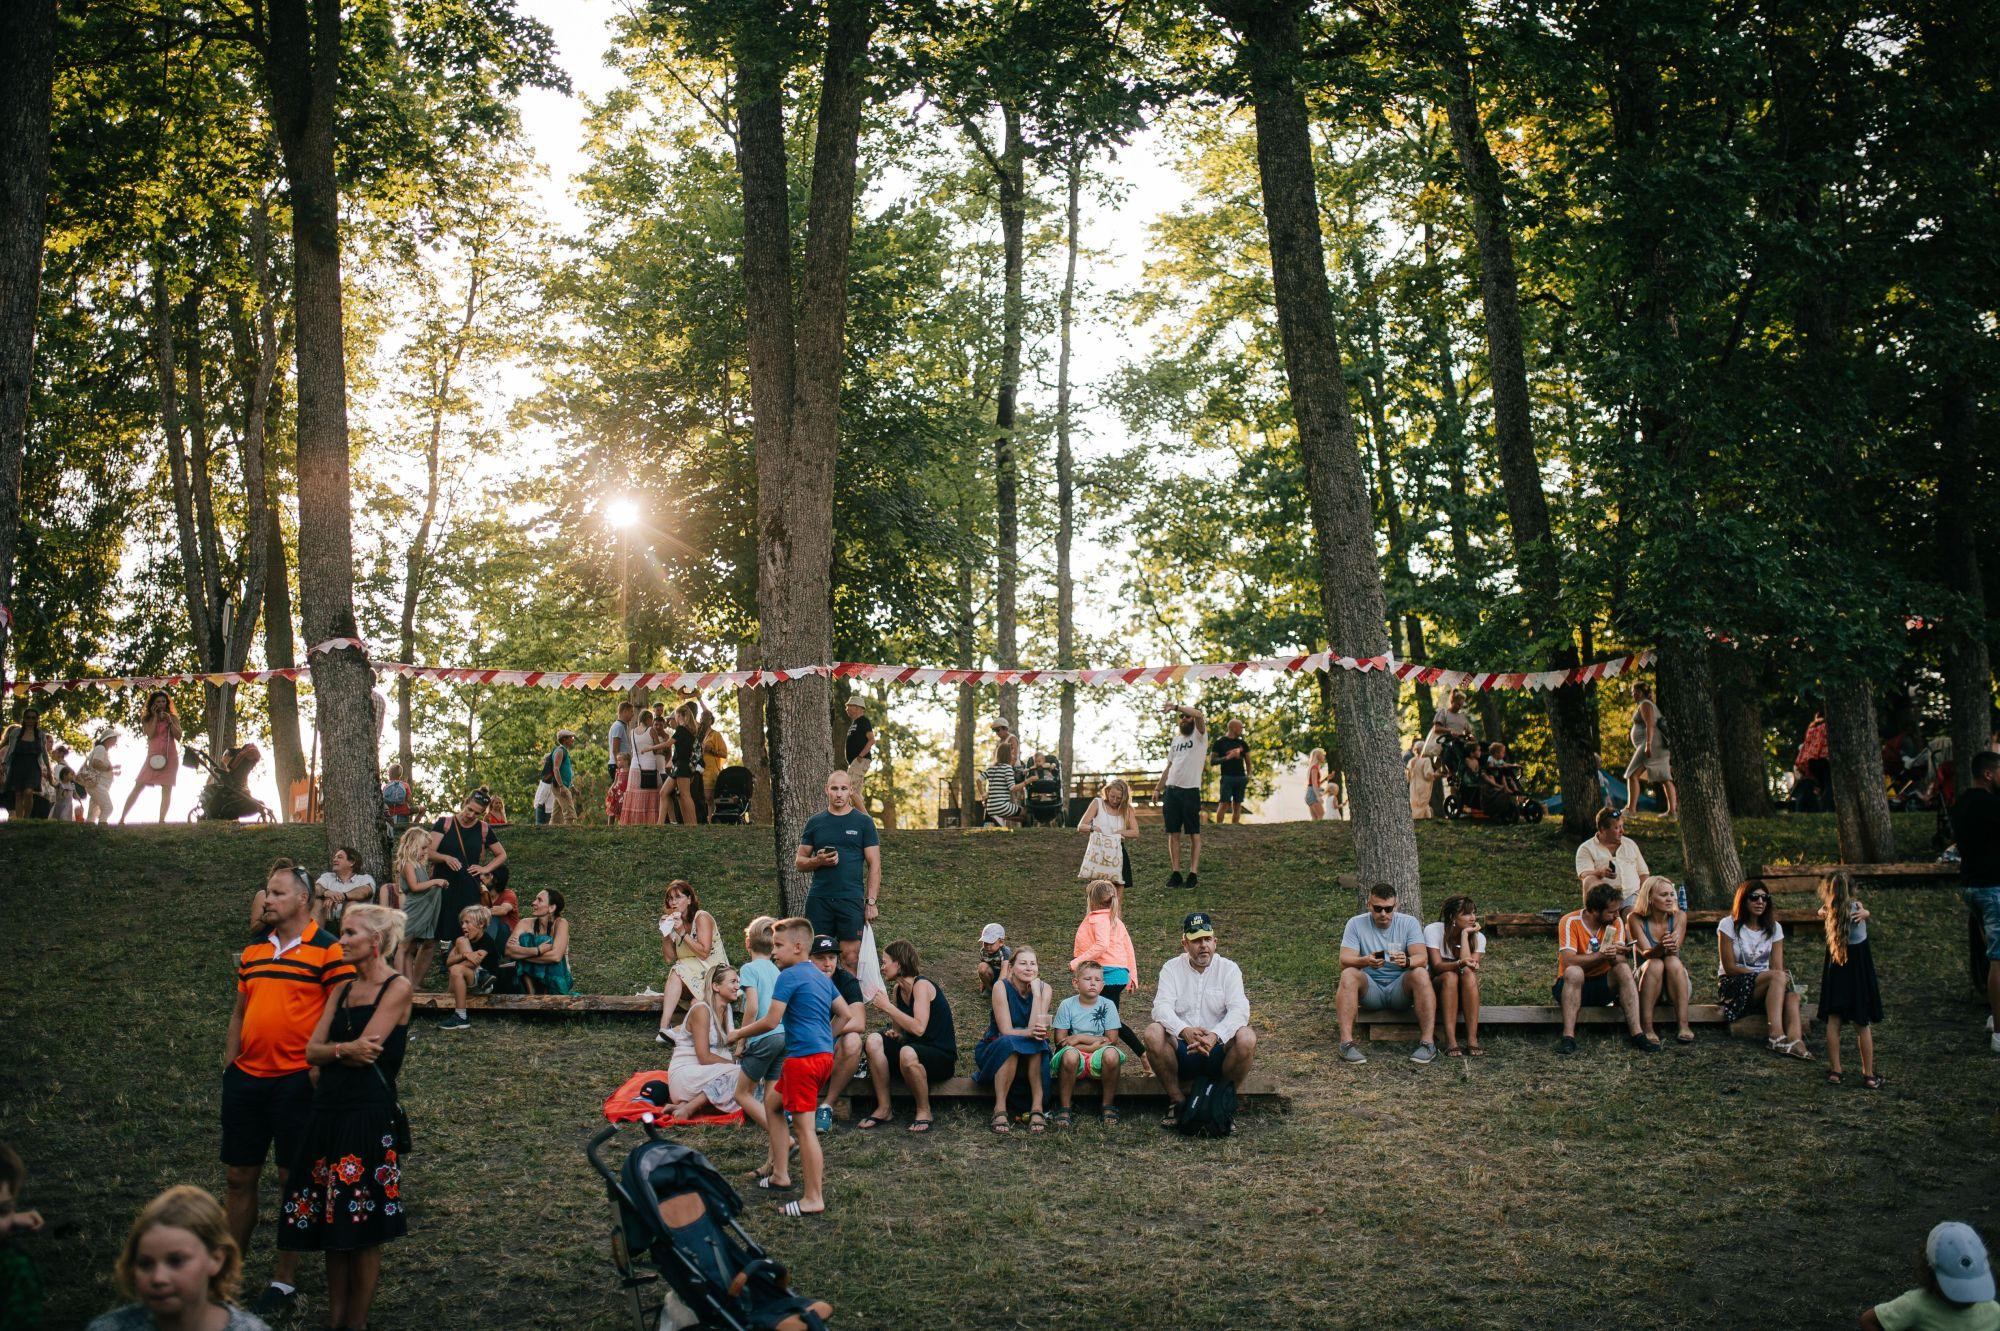 Foto: Festivali melu. Silver Tõnisson